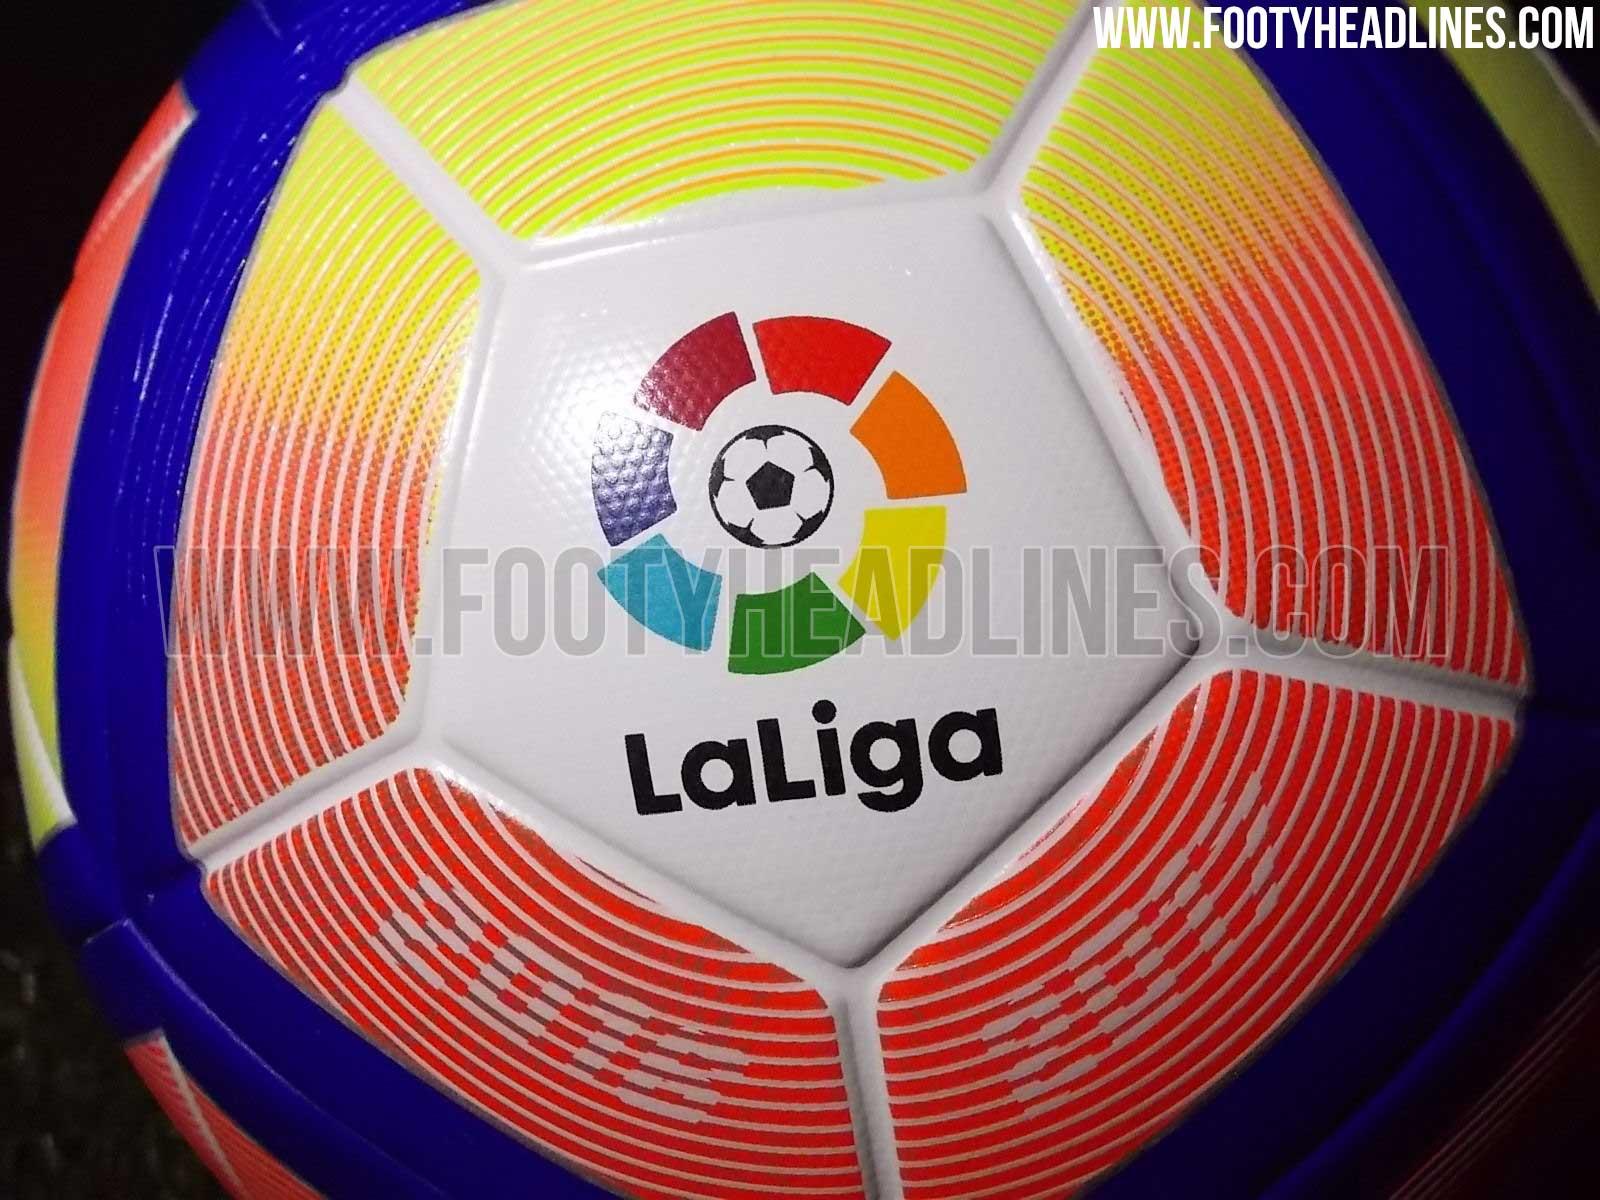 f99c277c466a Clearance Nike 16-17 La Liga Ball Revealed + New Ball Deal Announced